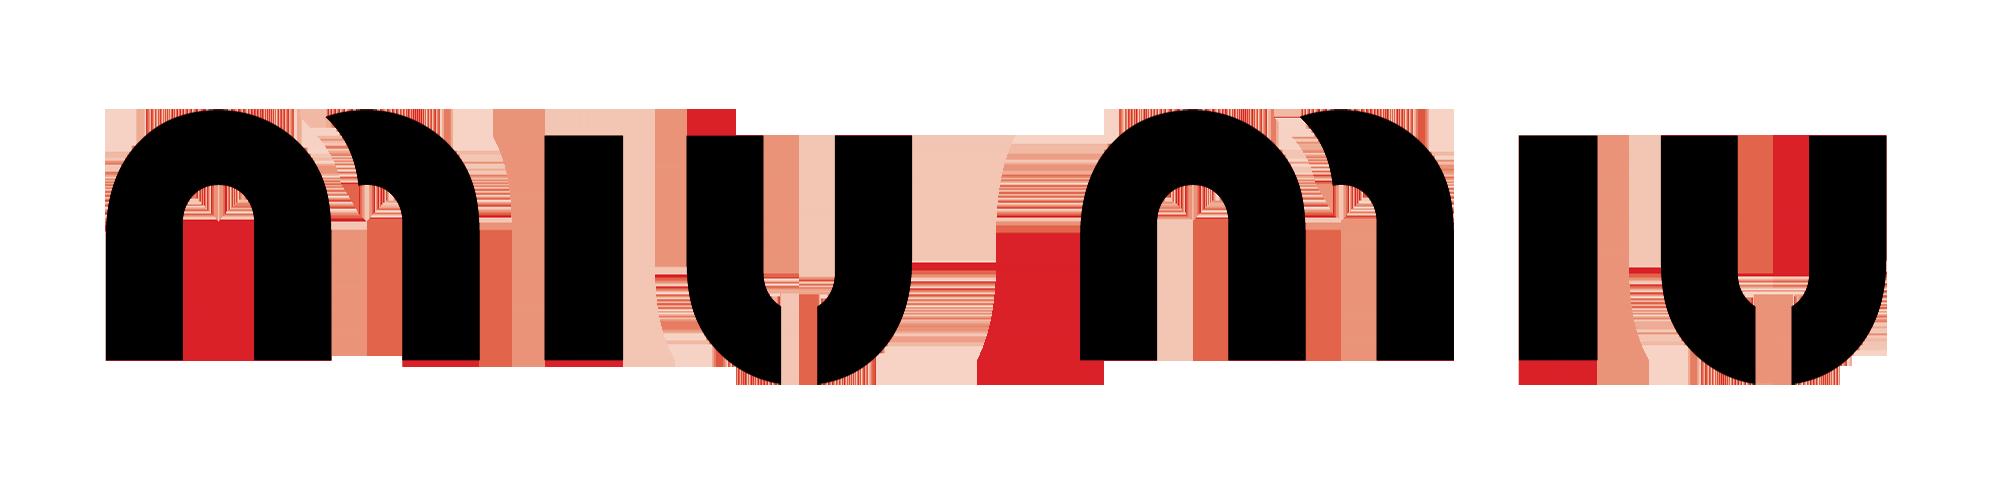 Картинки по запросу Miu Miu logo